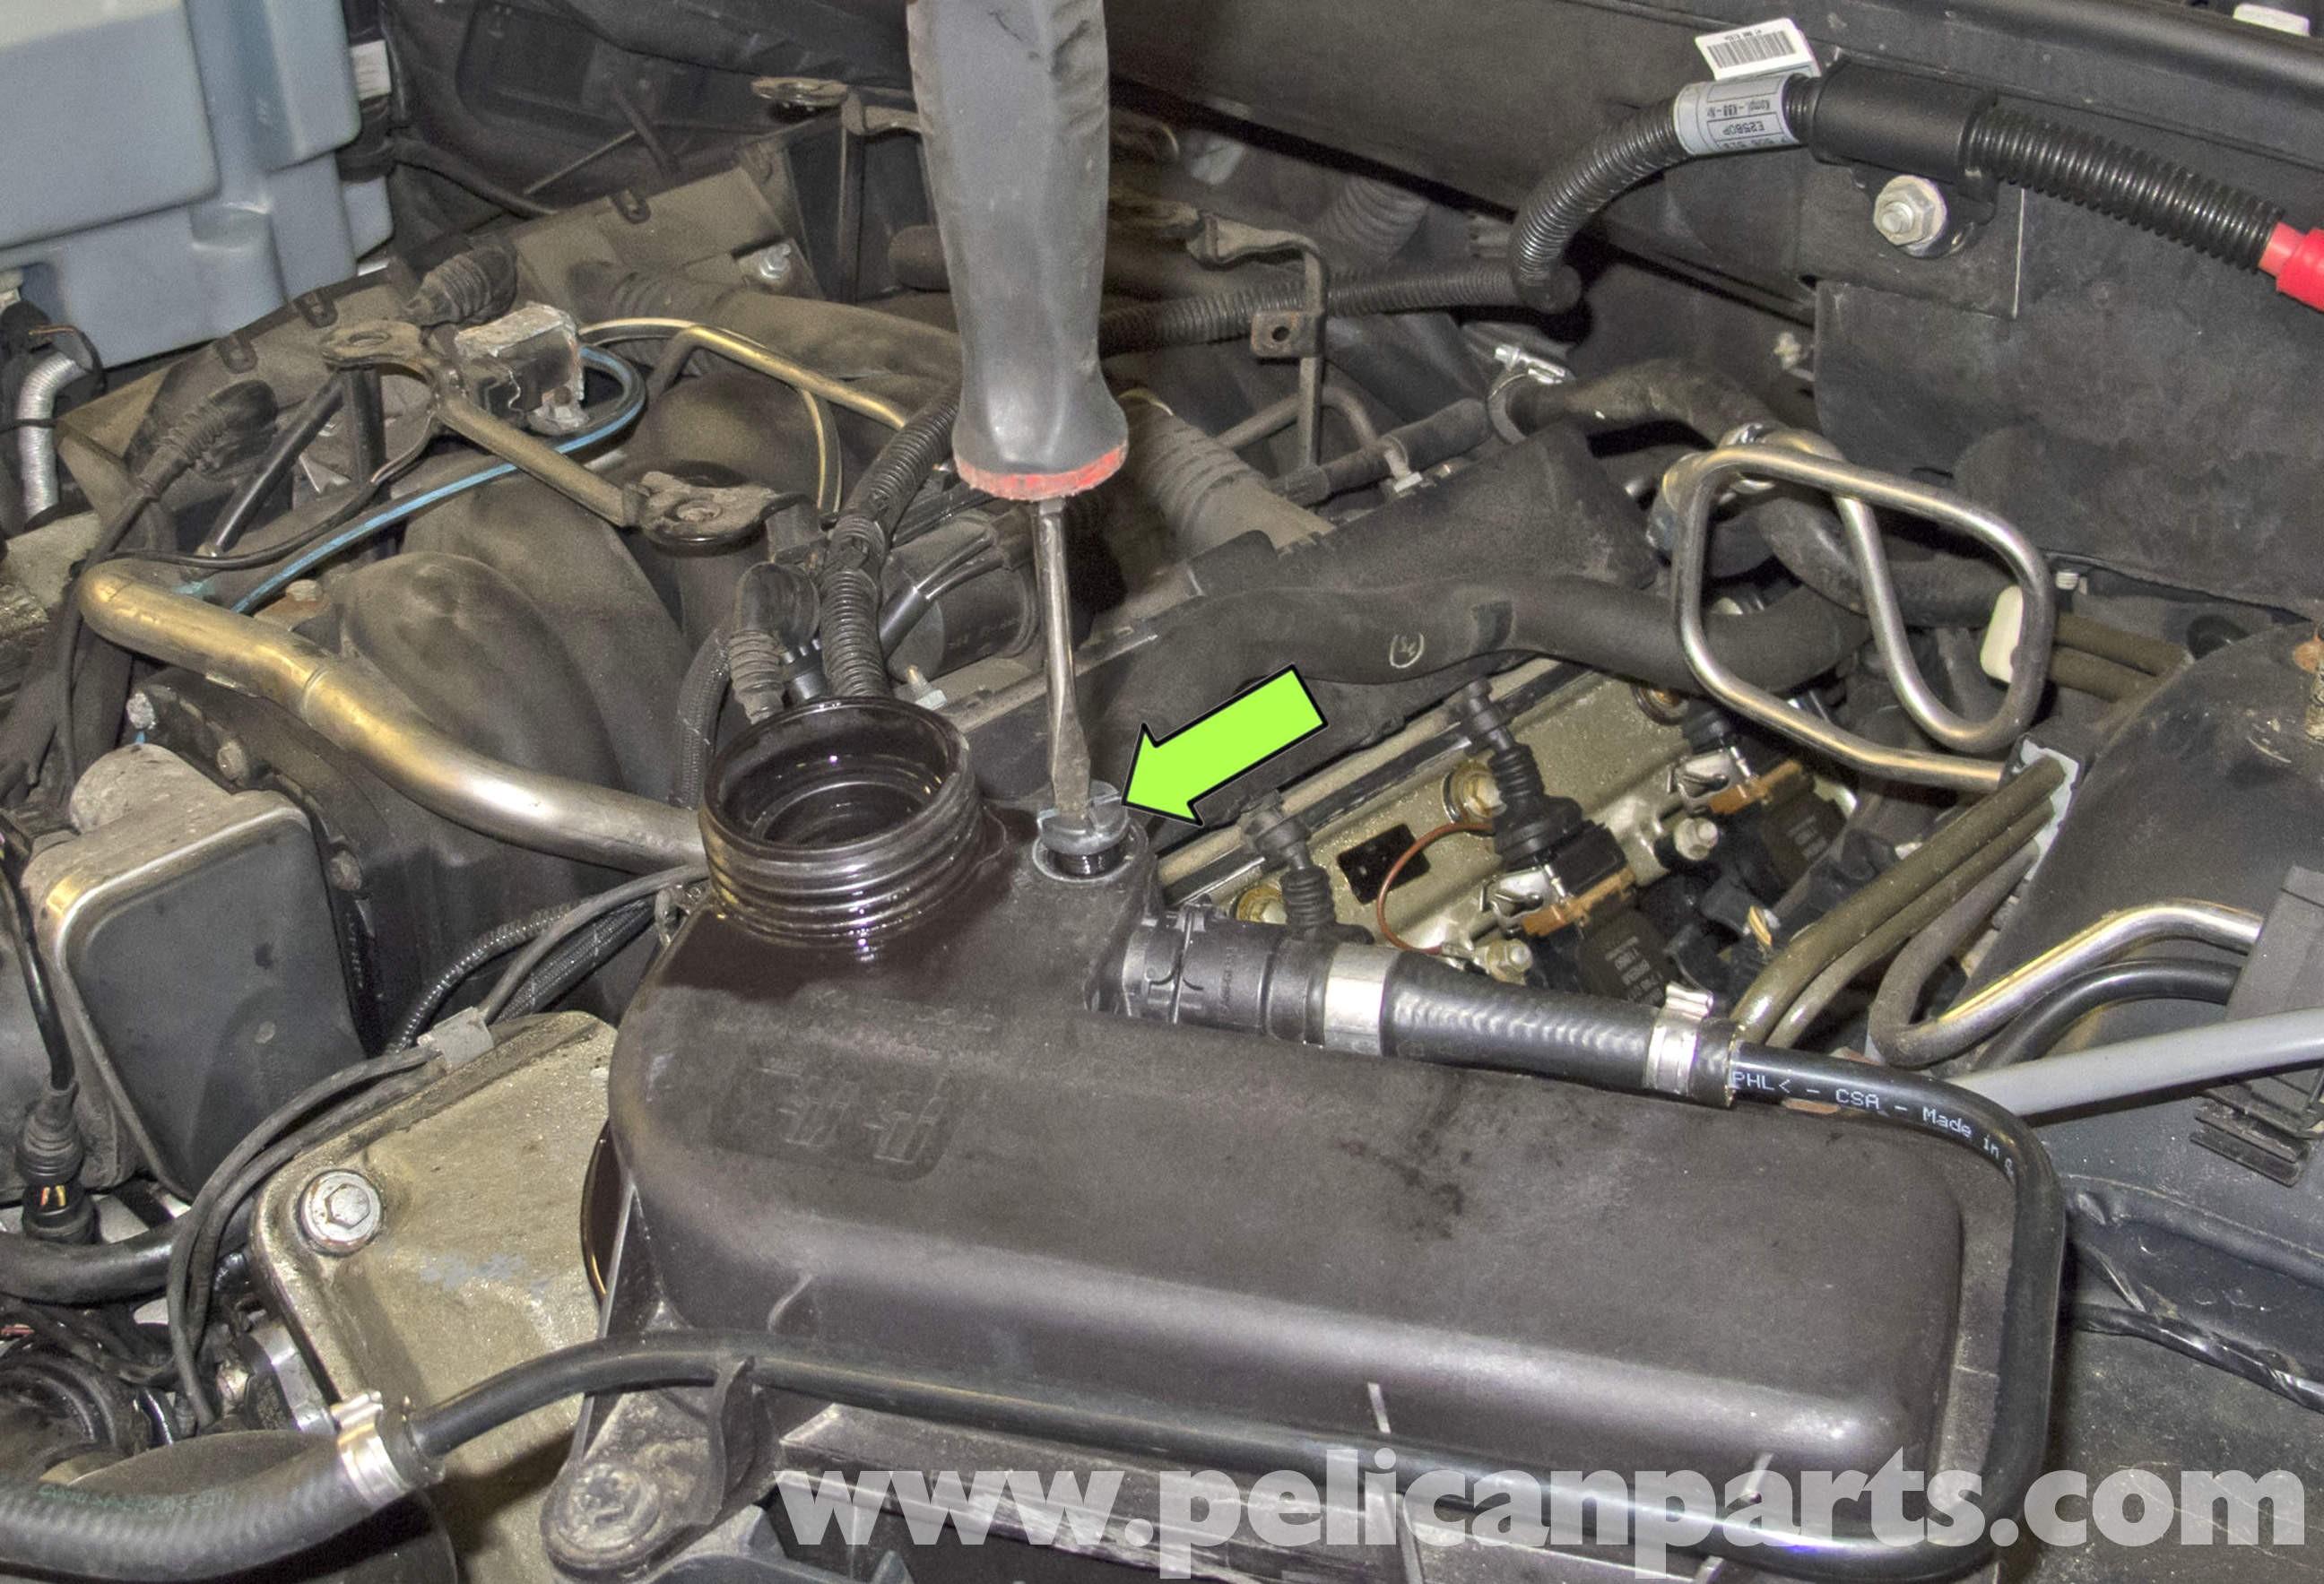 Car Radiator Diagram Bmw X5 Cooling System Draining and Filling E53 2000 2006 Of Car Radiator Diagram